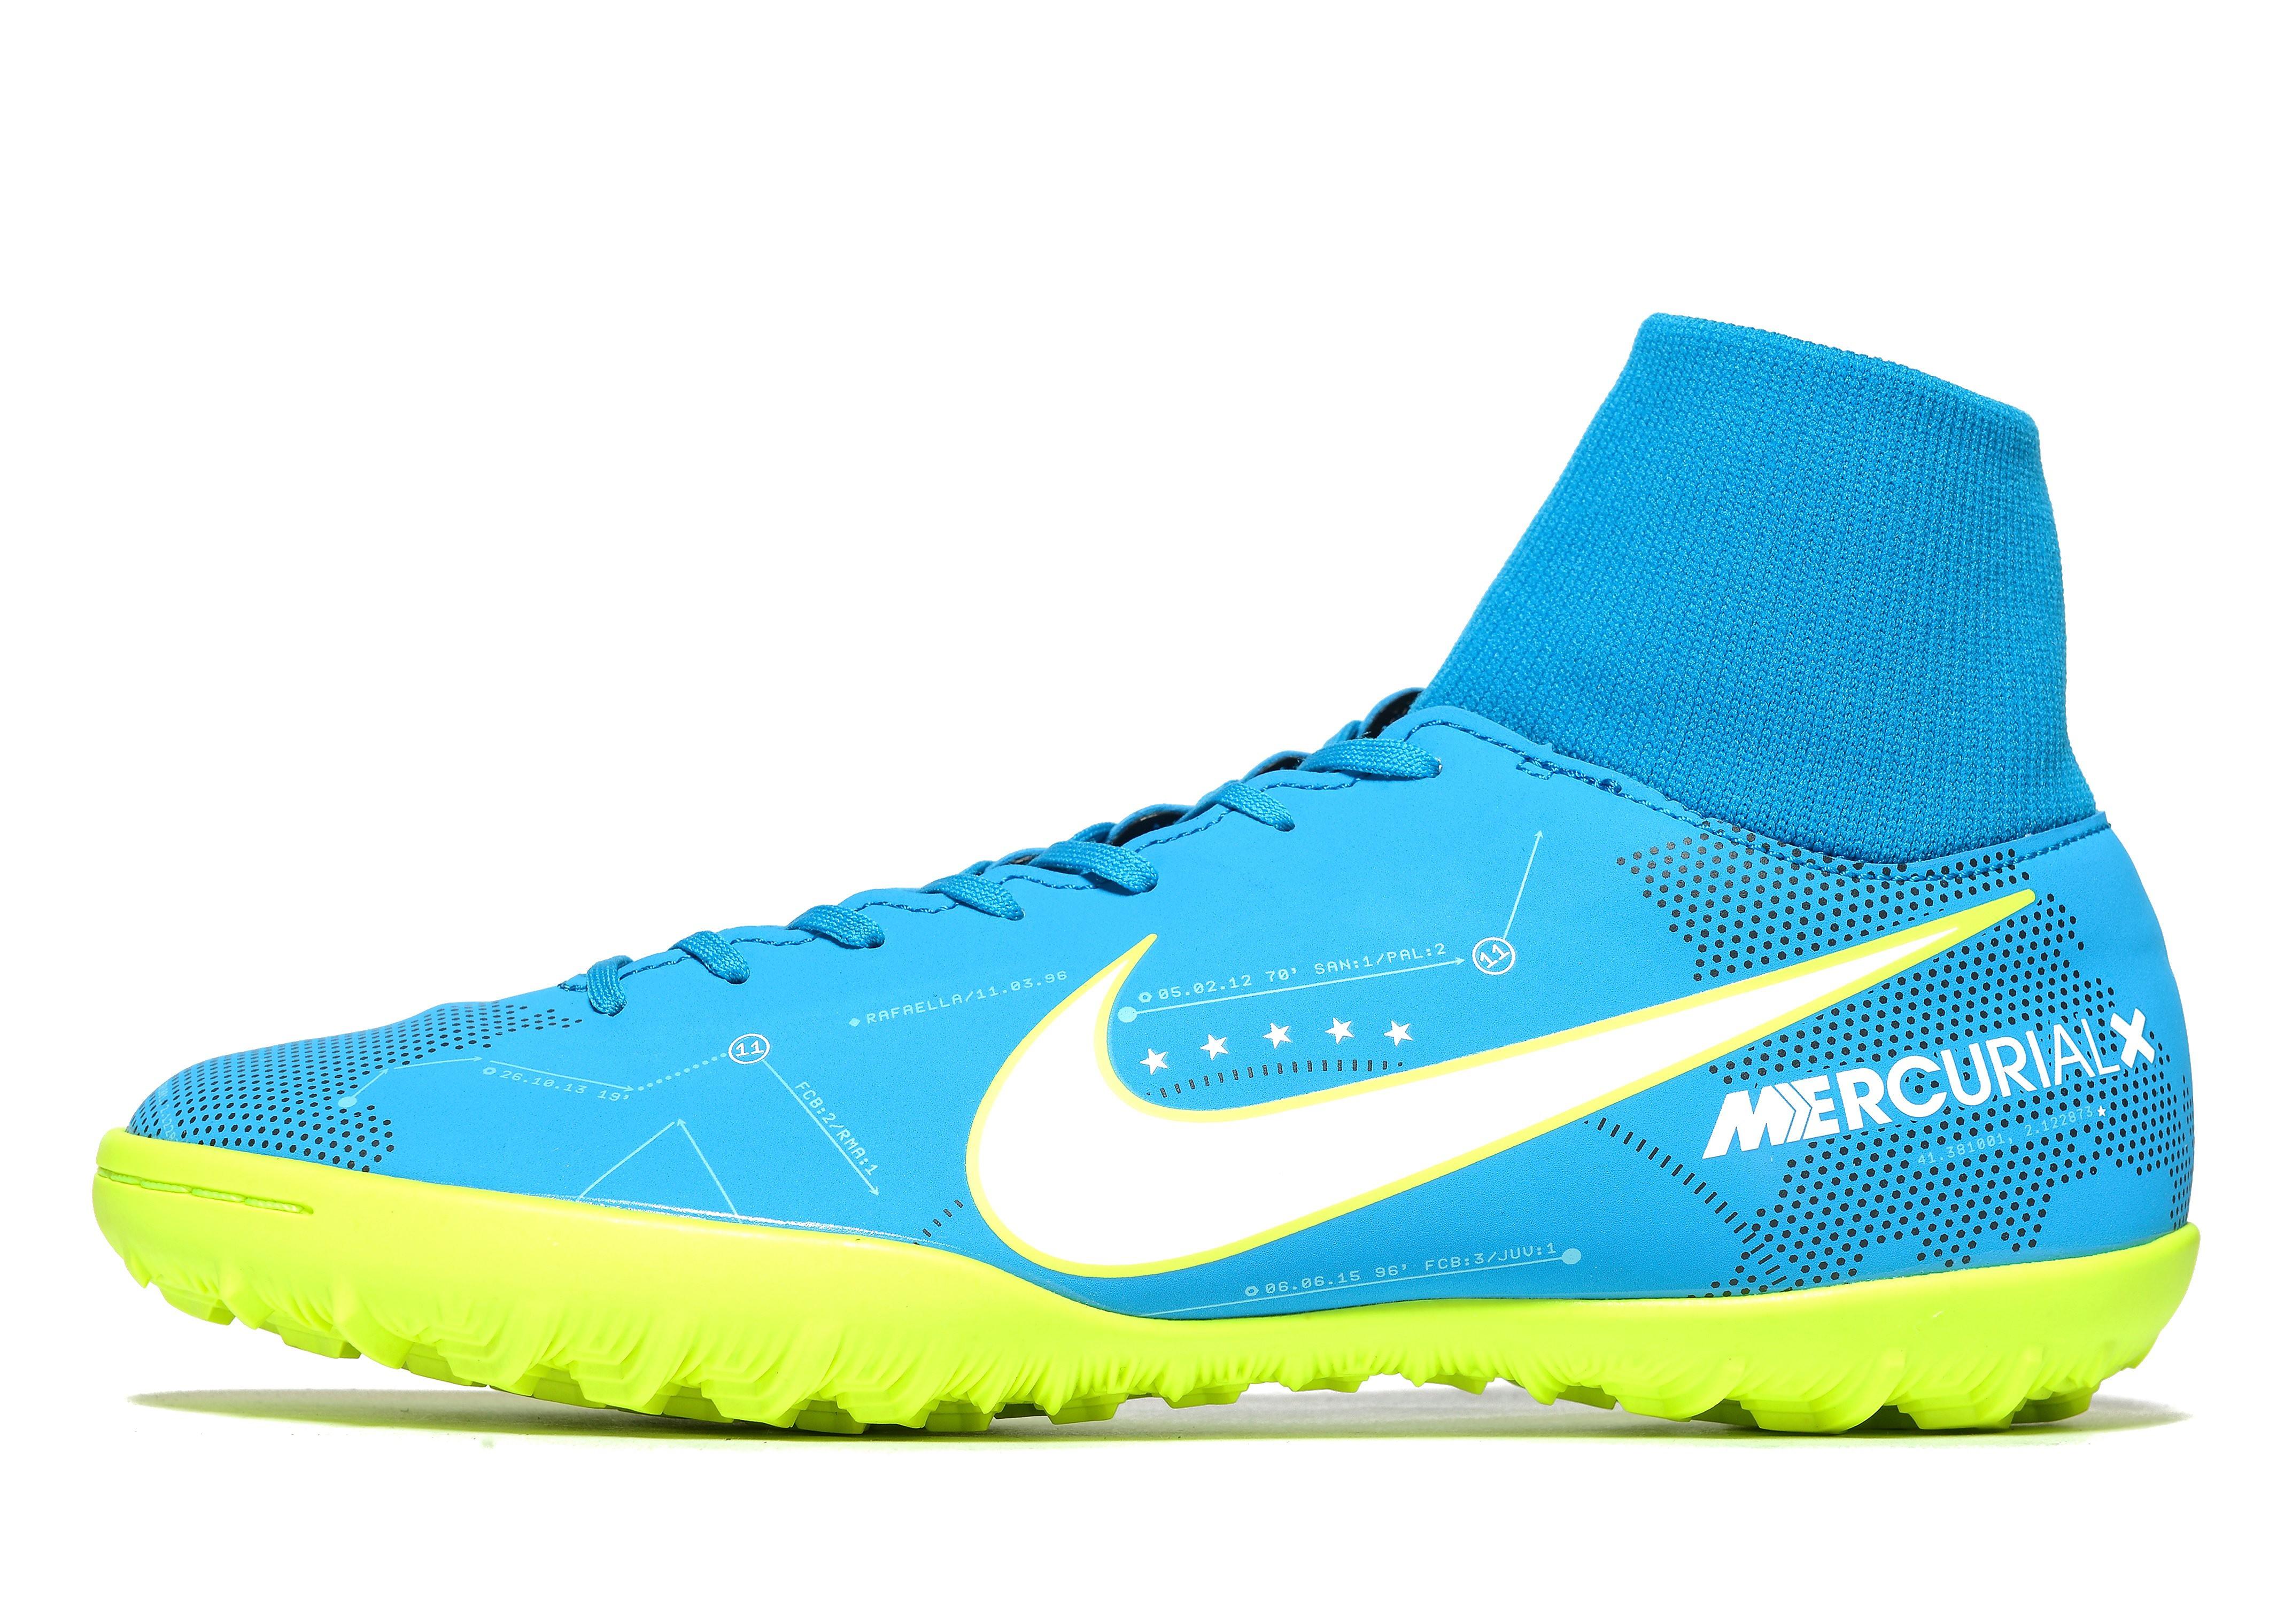 Nike Mercurial Victory Dynamic Fit Neymar Turf